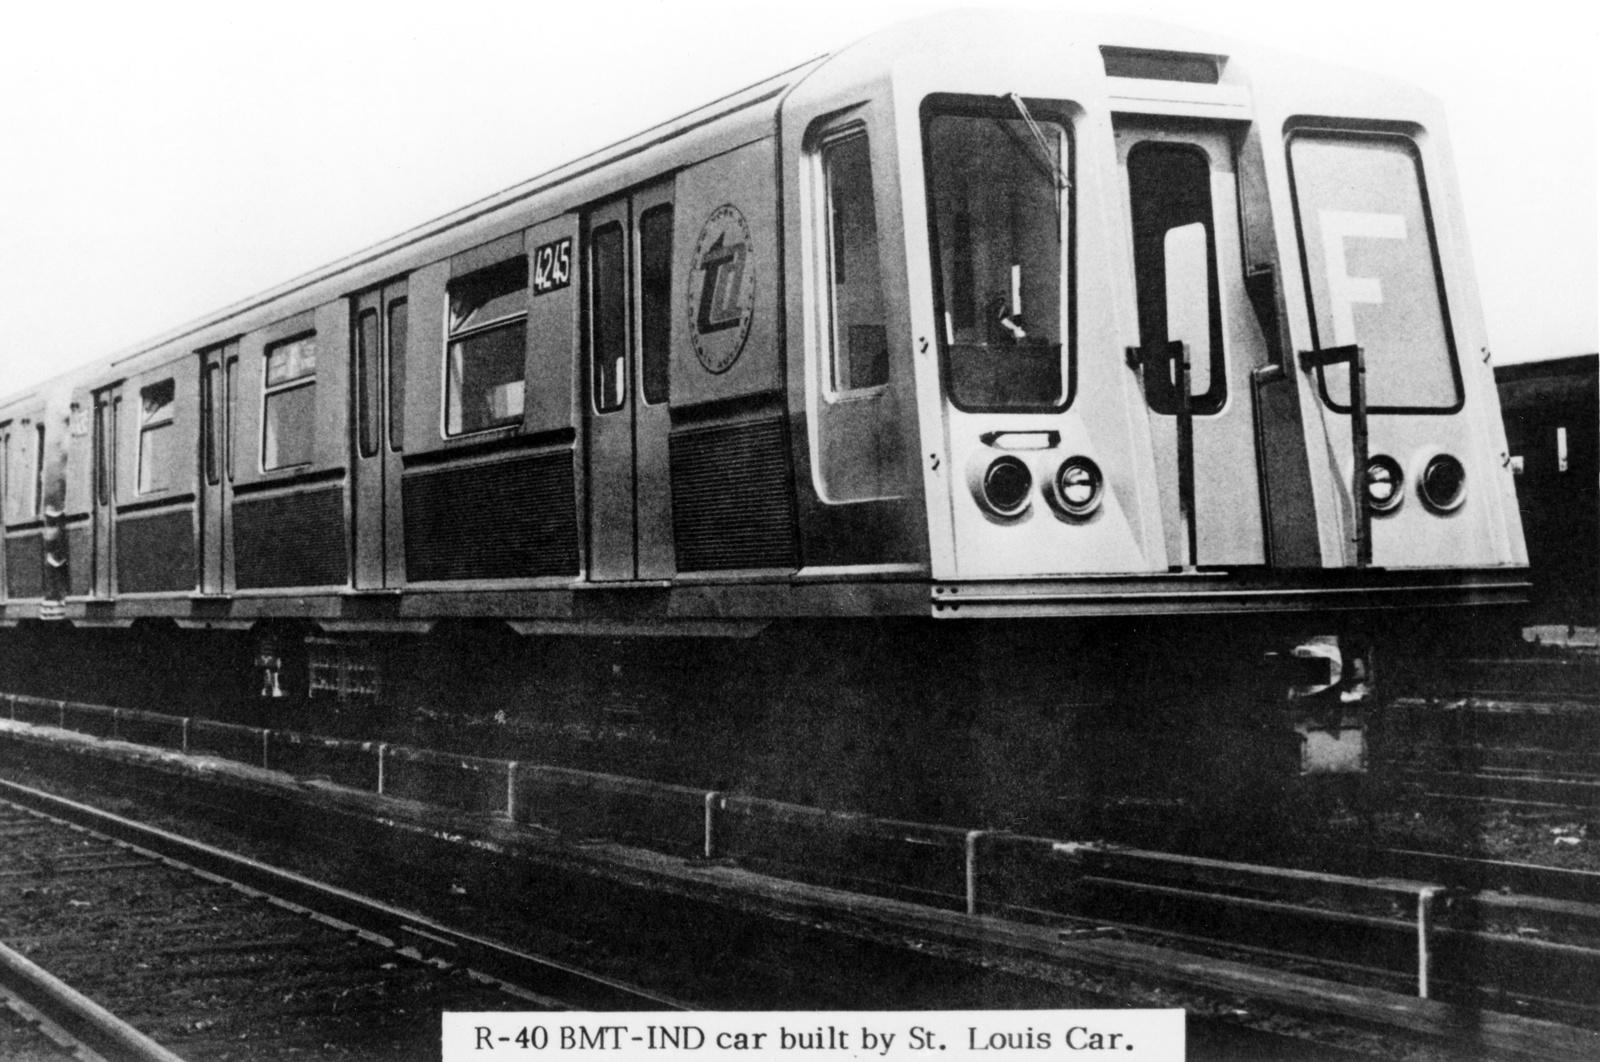 (220k, 1024x813)<br><b>Country:</b> United States<br><b>City:</b> New York<br><b>System:</b> New York City Transit<br><b>Location:</b> Coney Island Yard<br><b>Car:</b> R-40 (St. Louis, 1968)  4245 <br><b>Photo by:</b> Ed Watson/Arthur Lonto Collection<br><b>Collection of:</b> Frank Pfuhler<br><b>Date:</b> 1/1969<br><b>Viewed (this week/total):</b> 2 / 934